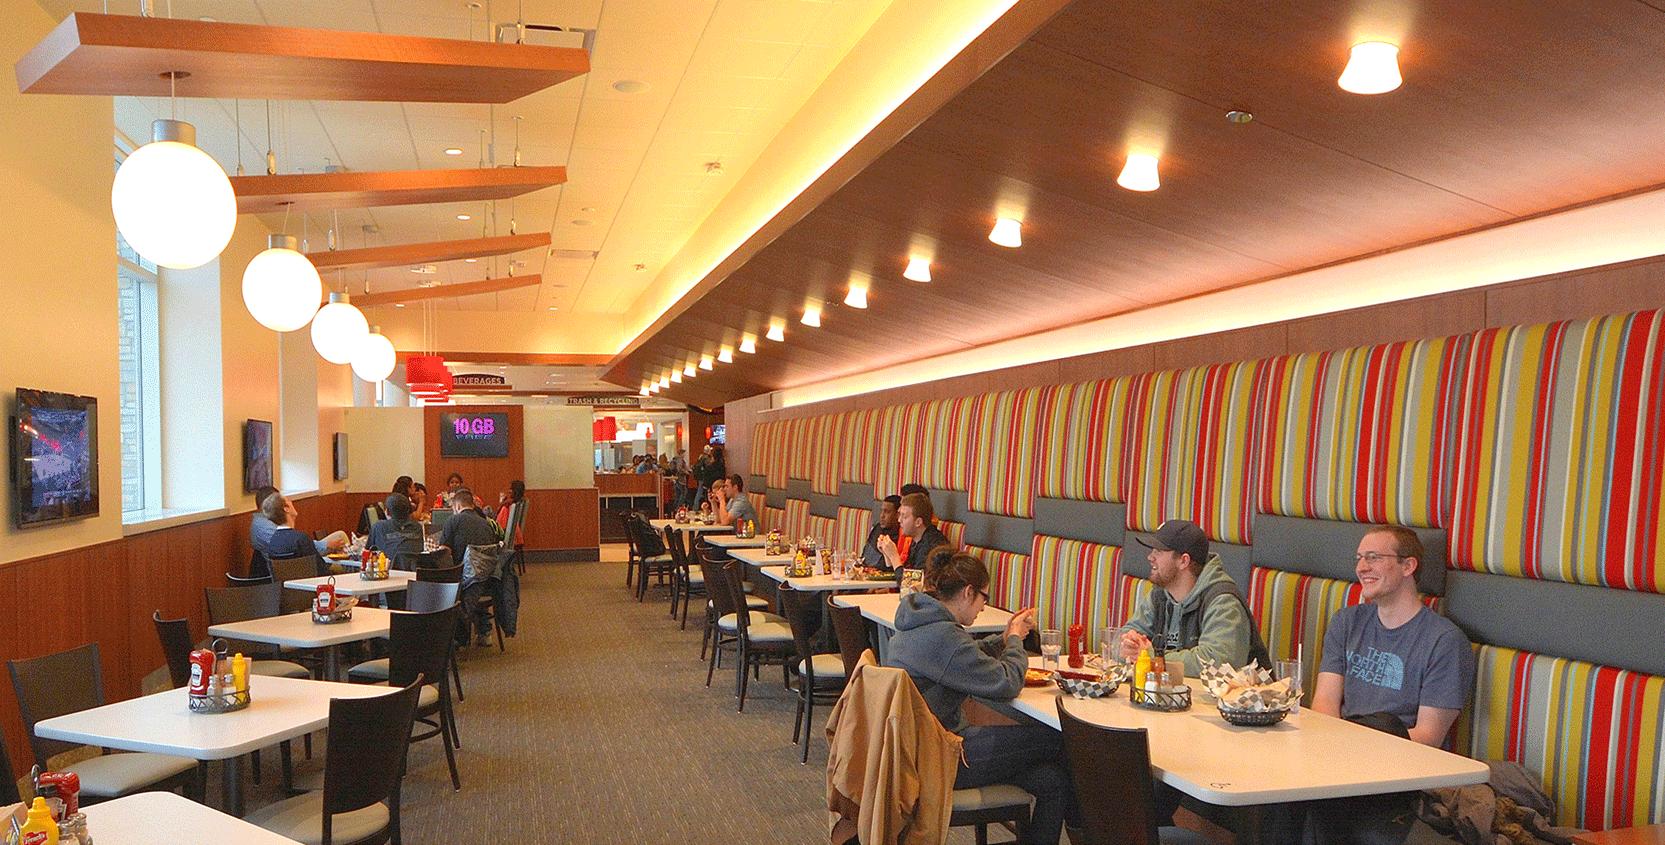 Ferris-State-University-University-Center-Dining-2-1665x845